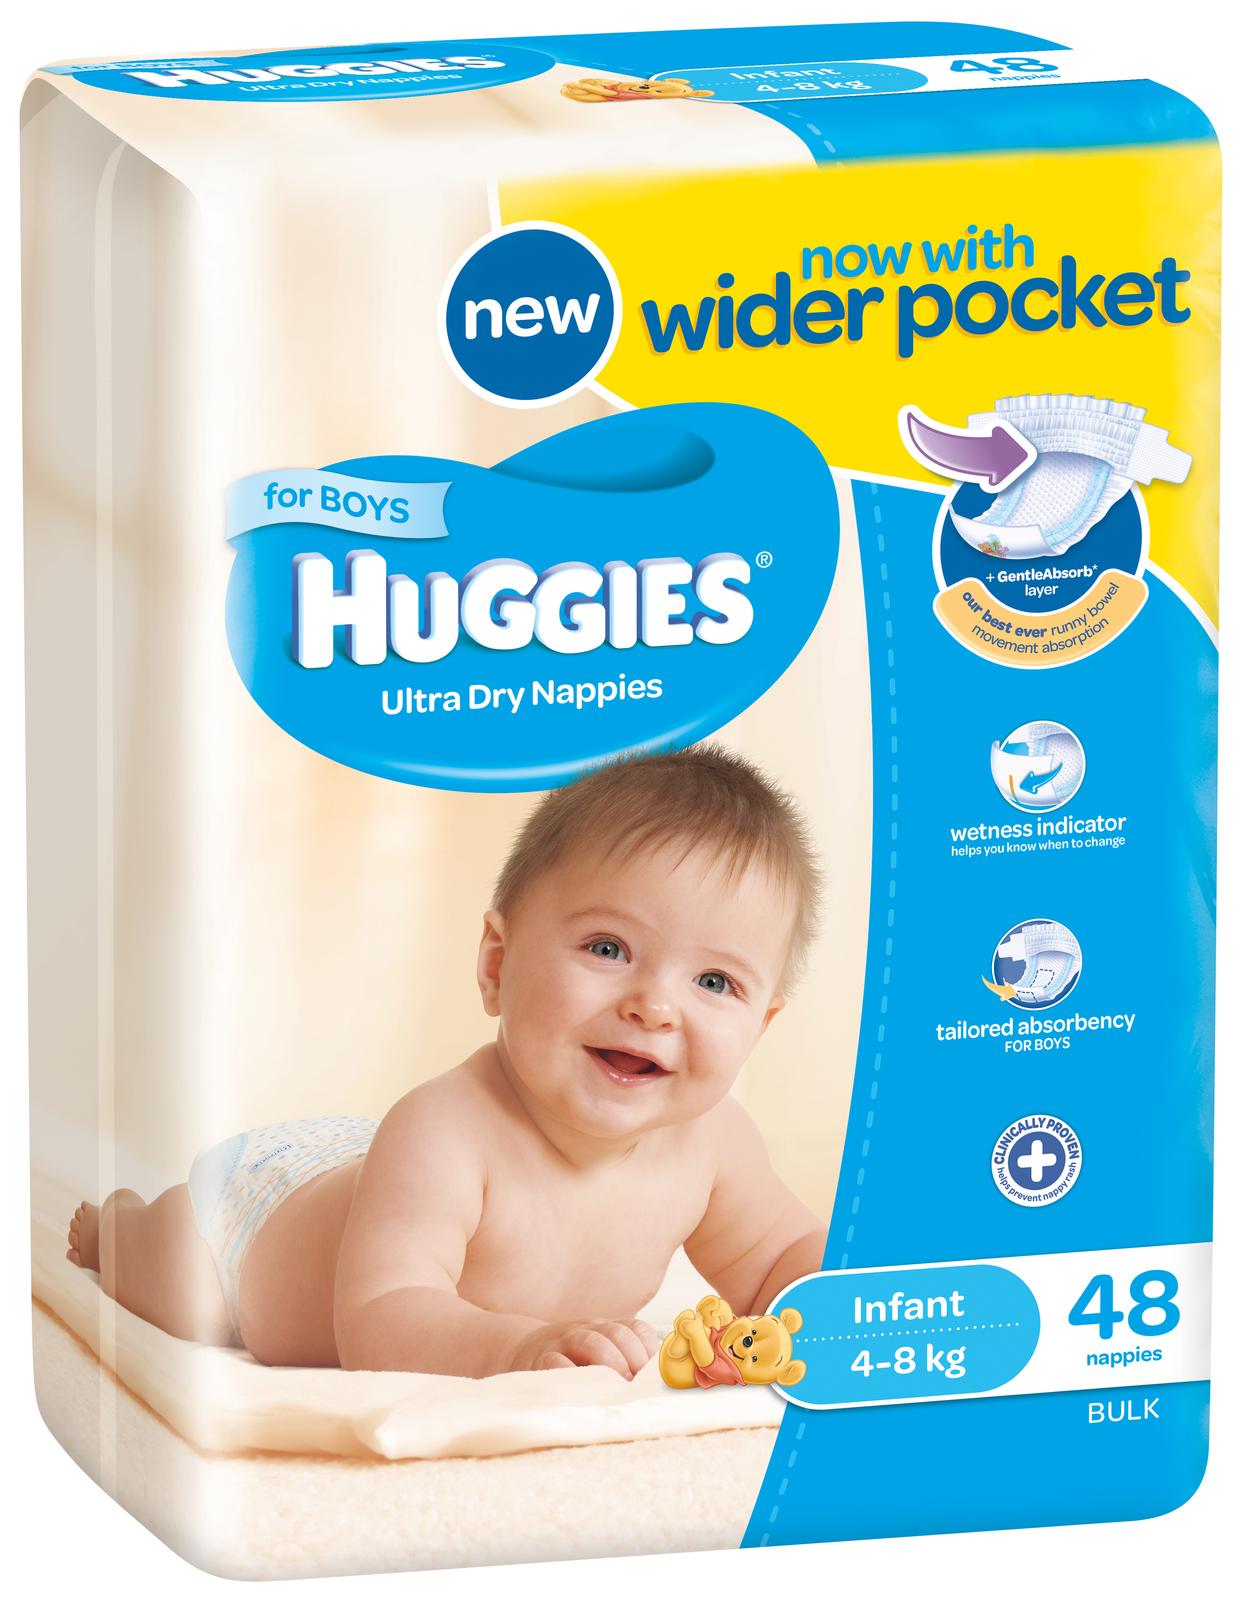 buy huggies nappies bulk infant boy 4 8kg 48 at mighty ape nz